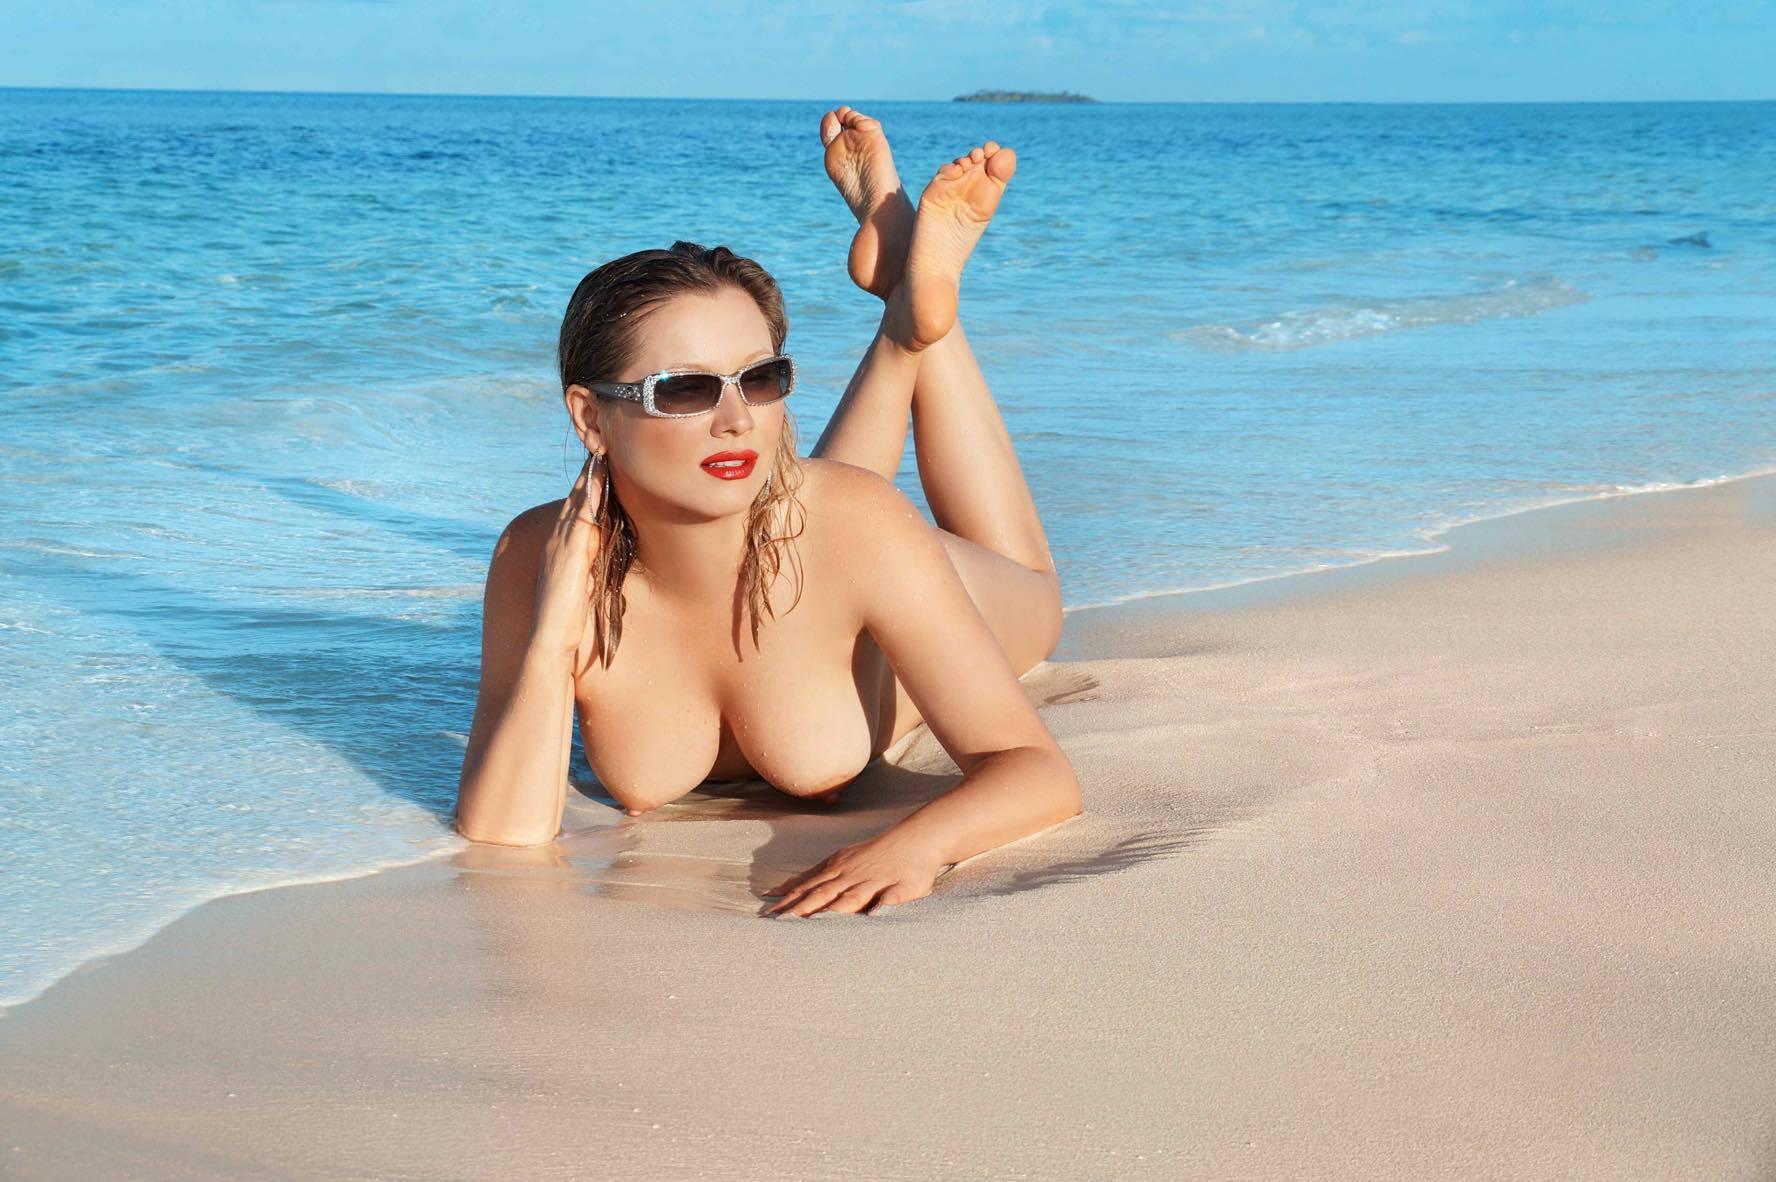 Раннее утреннее купание не спасло Лену от нескромного объектива французского фотографа.